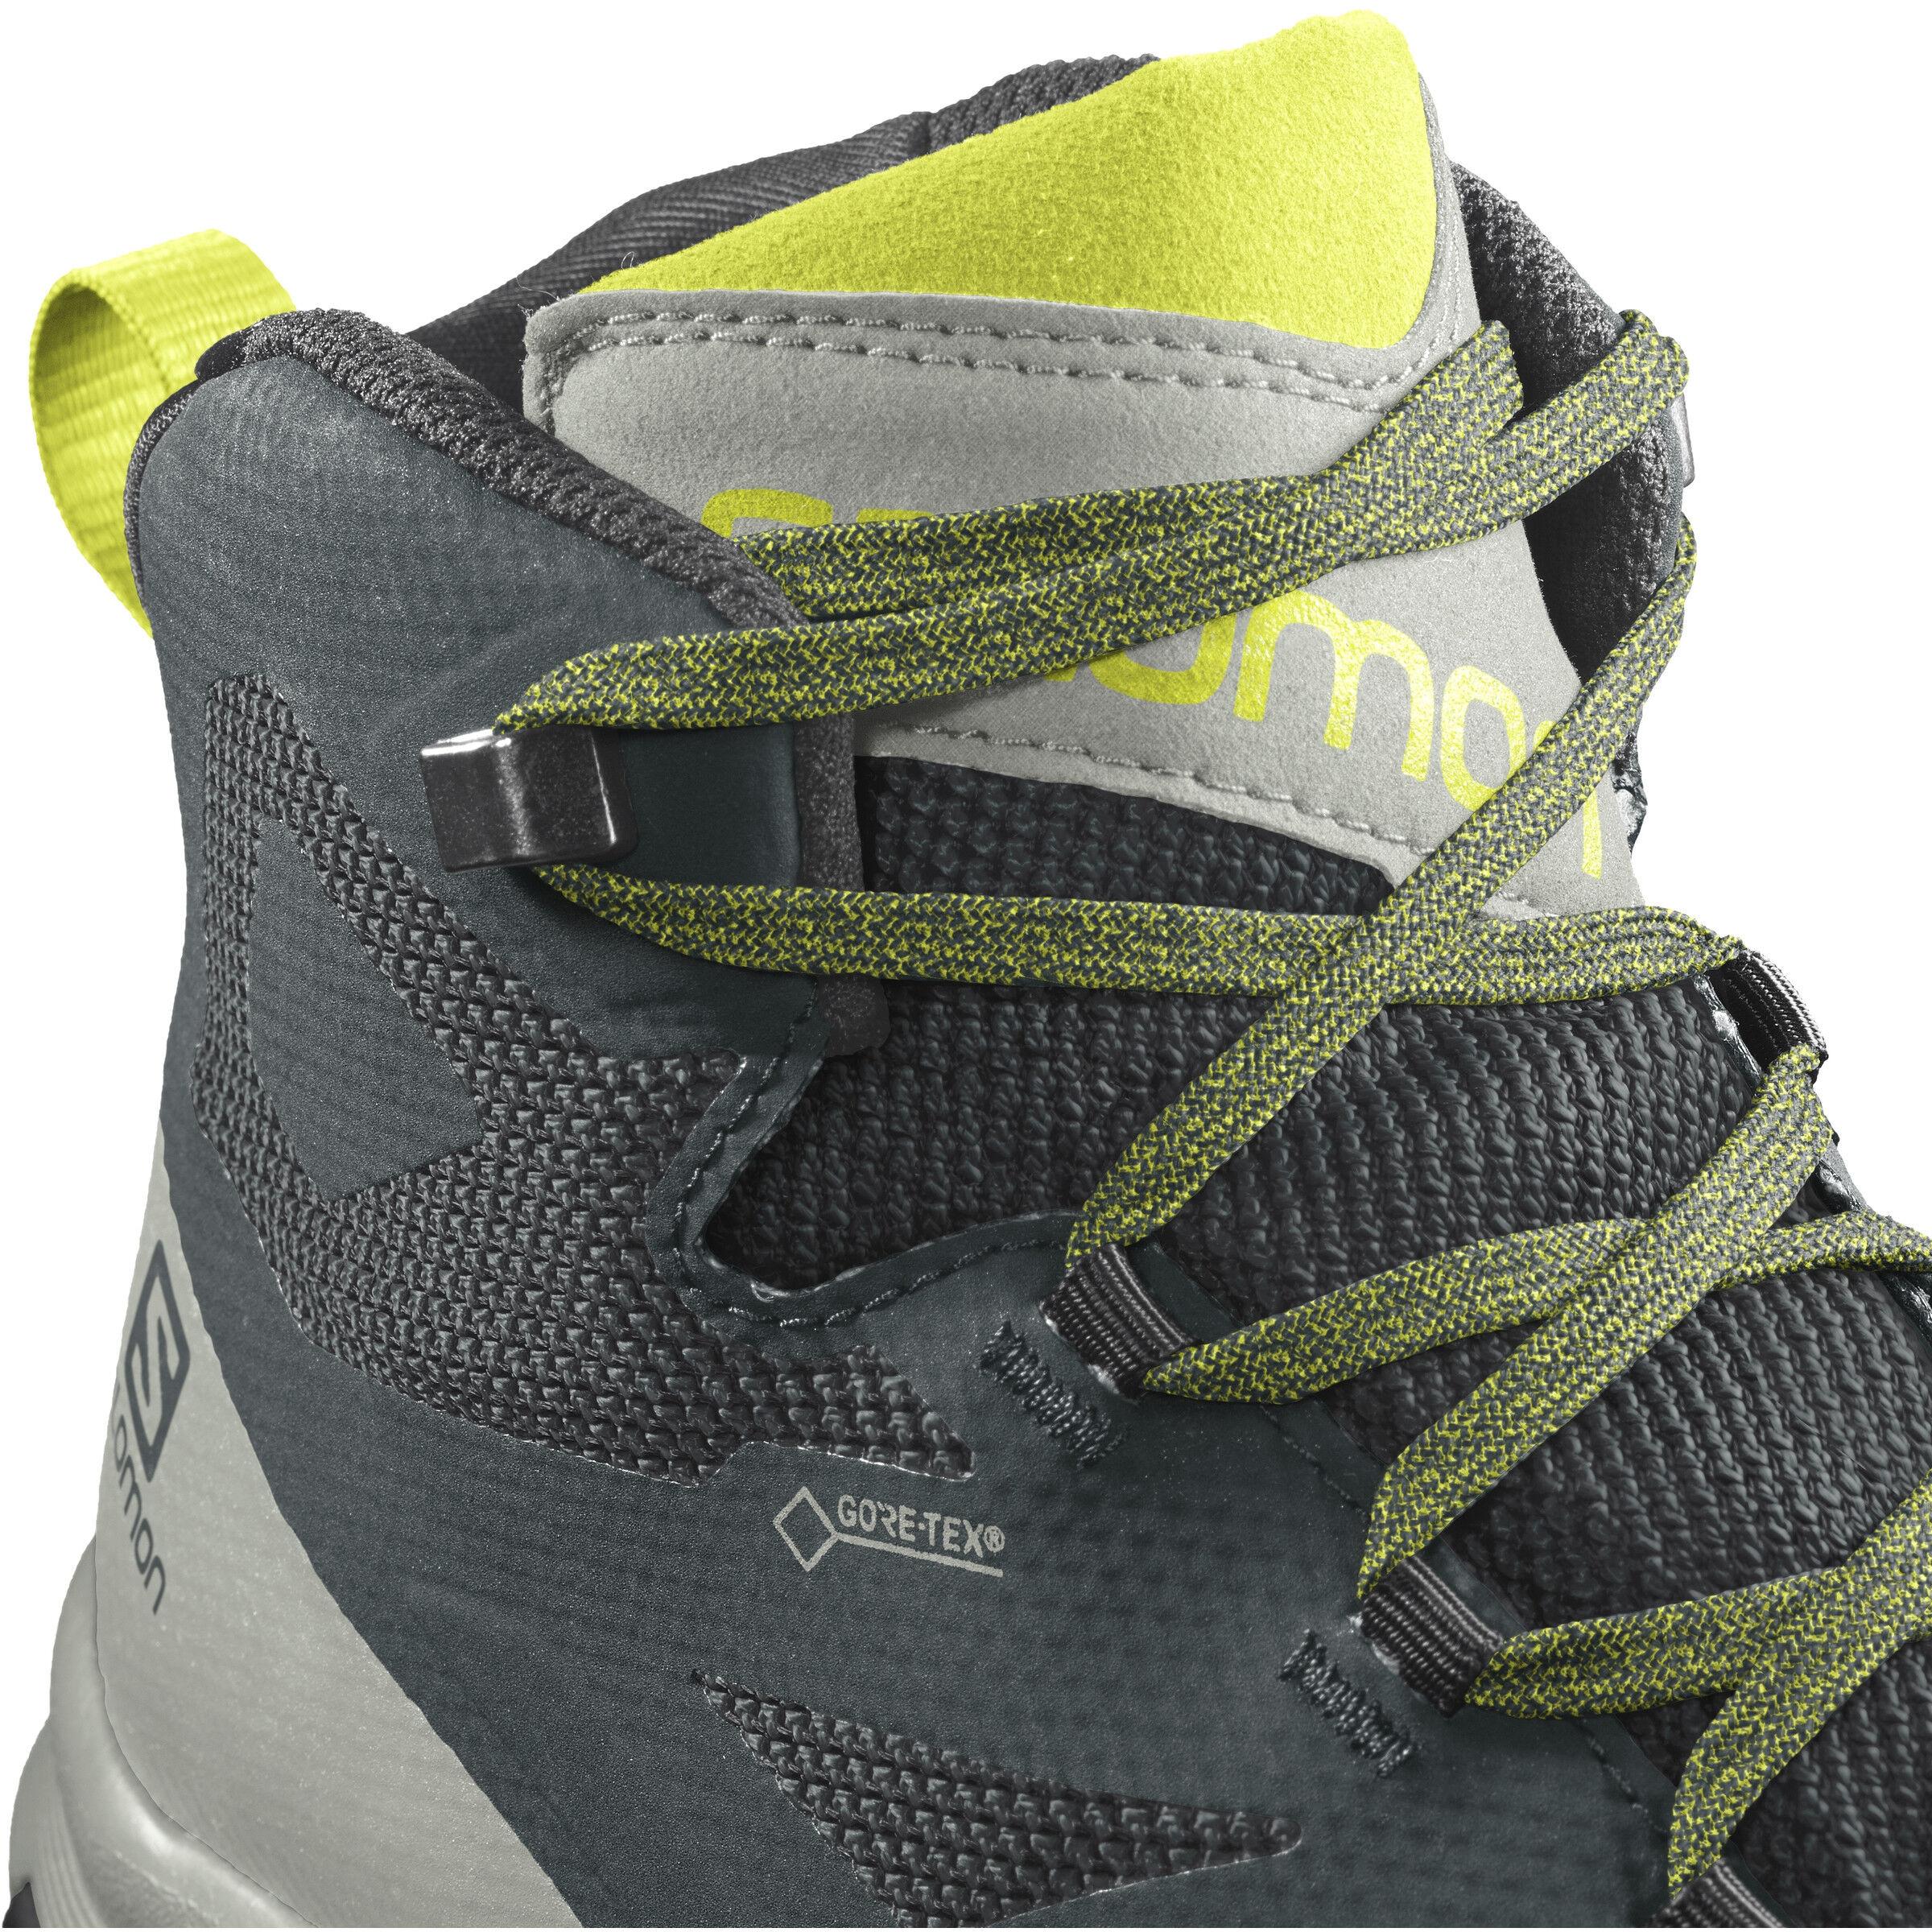 Salomon OUTline GTX Mid Cut Schuhe Herren green gablesmineral grayevening primrose